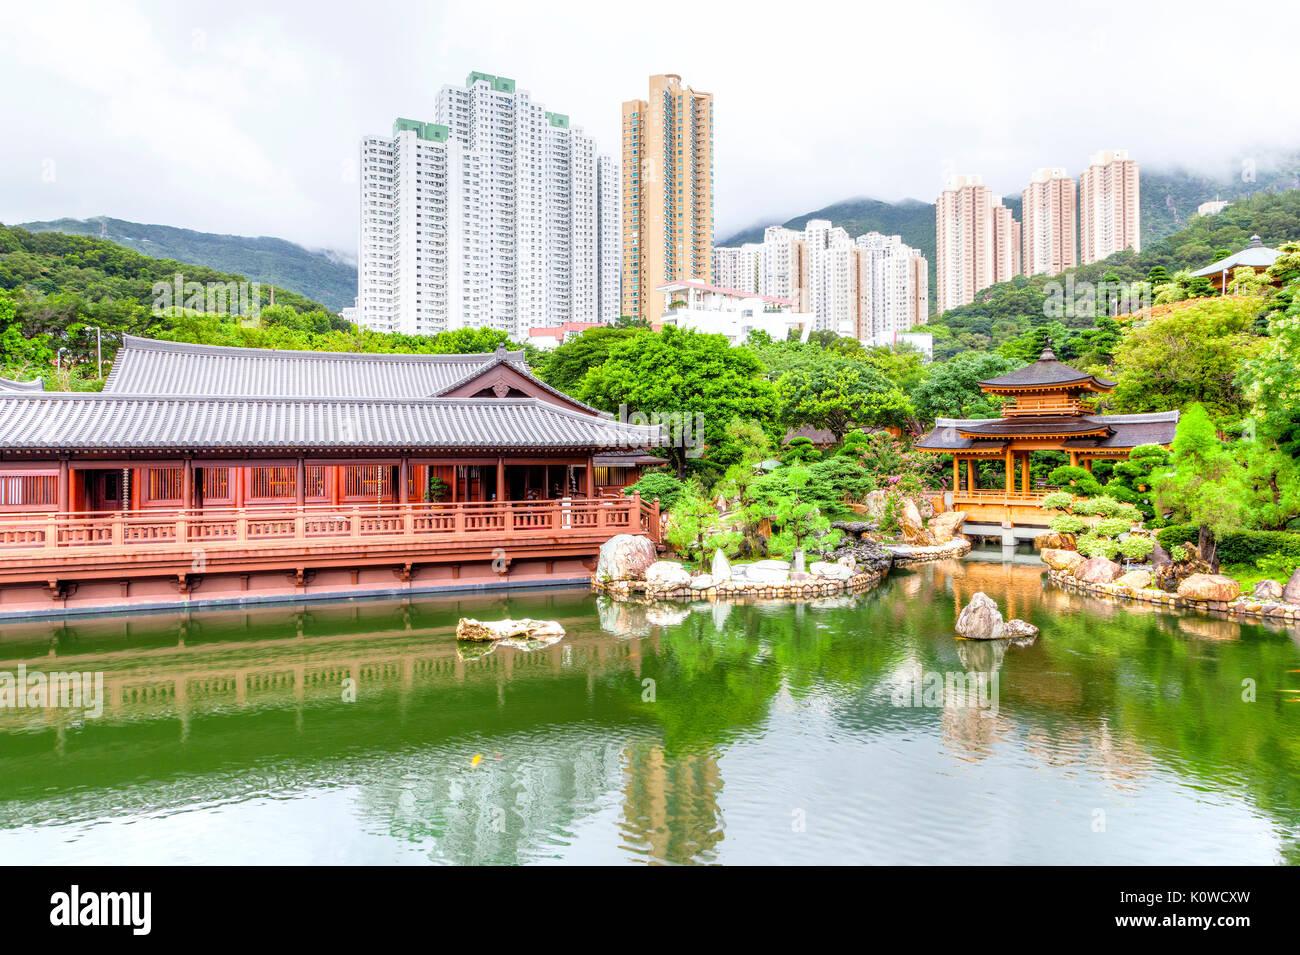 Blue Pond And Pavilion Bridge At Nan Lian Garden, A Chinese Classical Garden  In Diamond